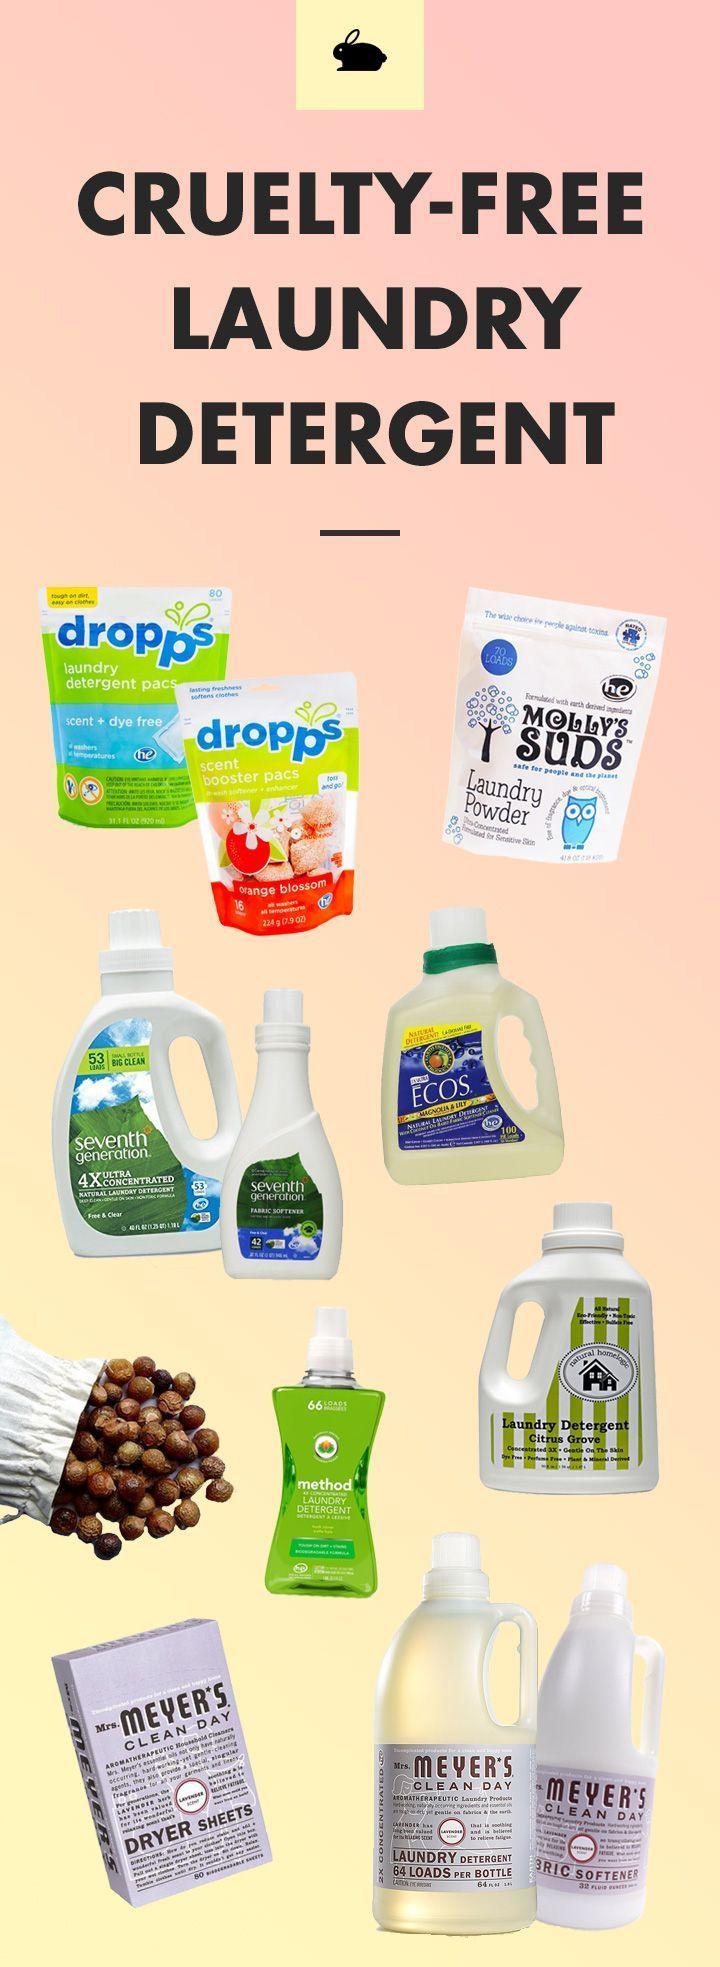 CrueltyFree Laundry Detergent & Fabric Softener Cruelty